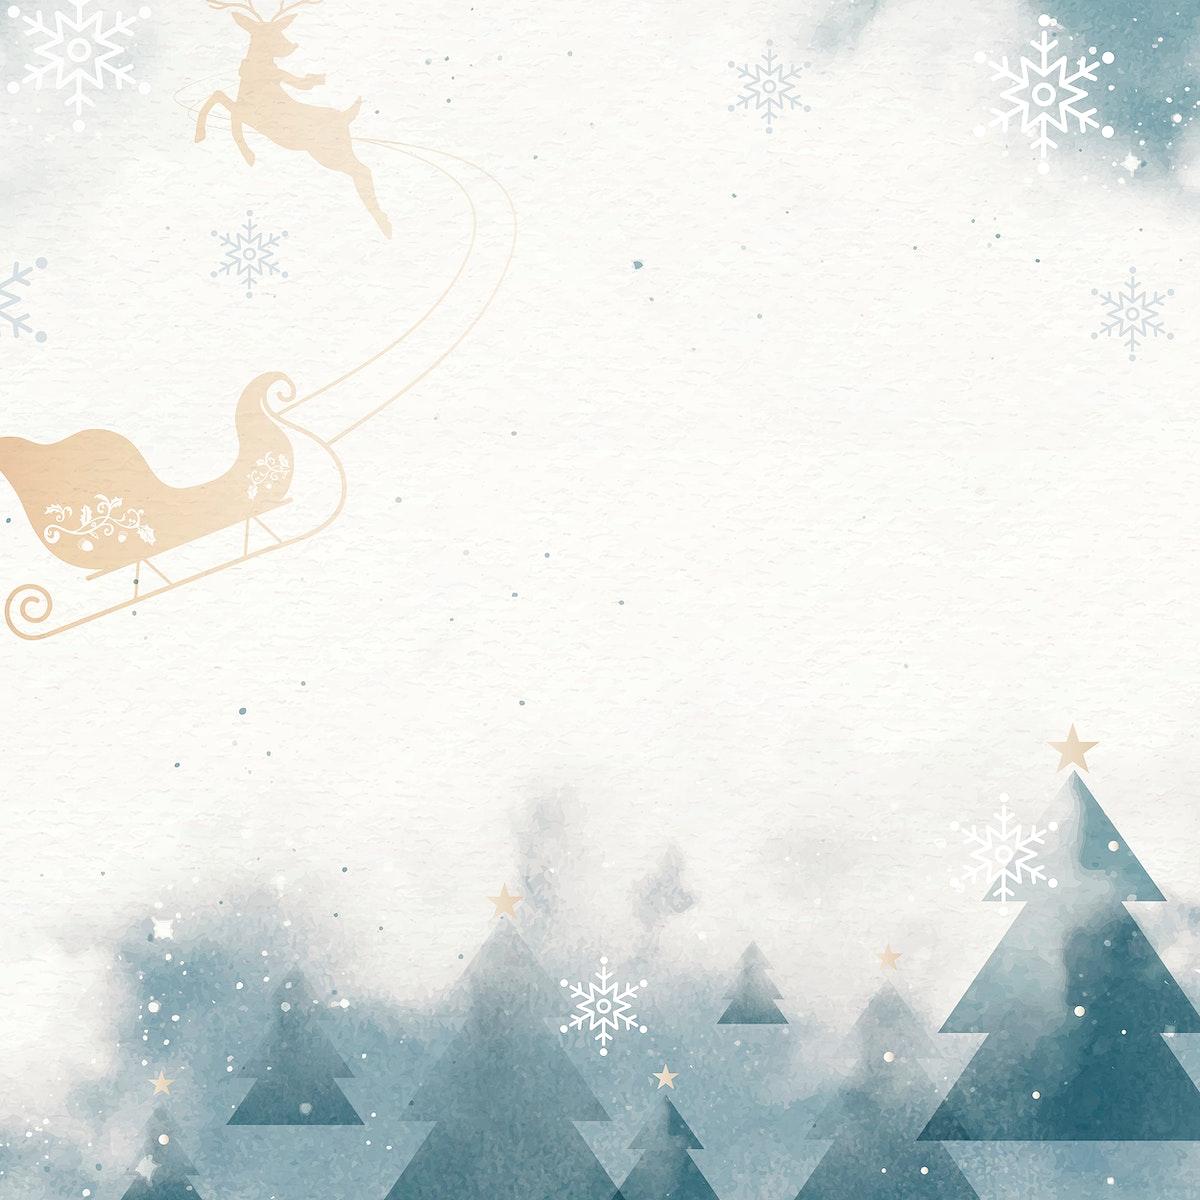 Sleigh with reindeer over winter landscape vector